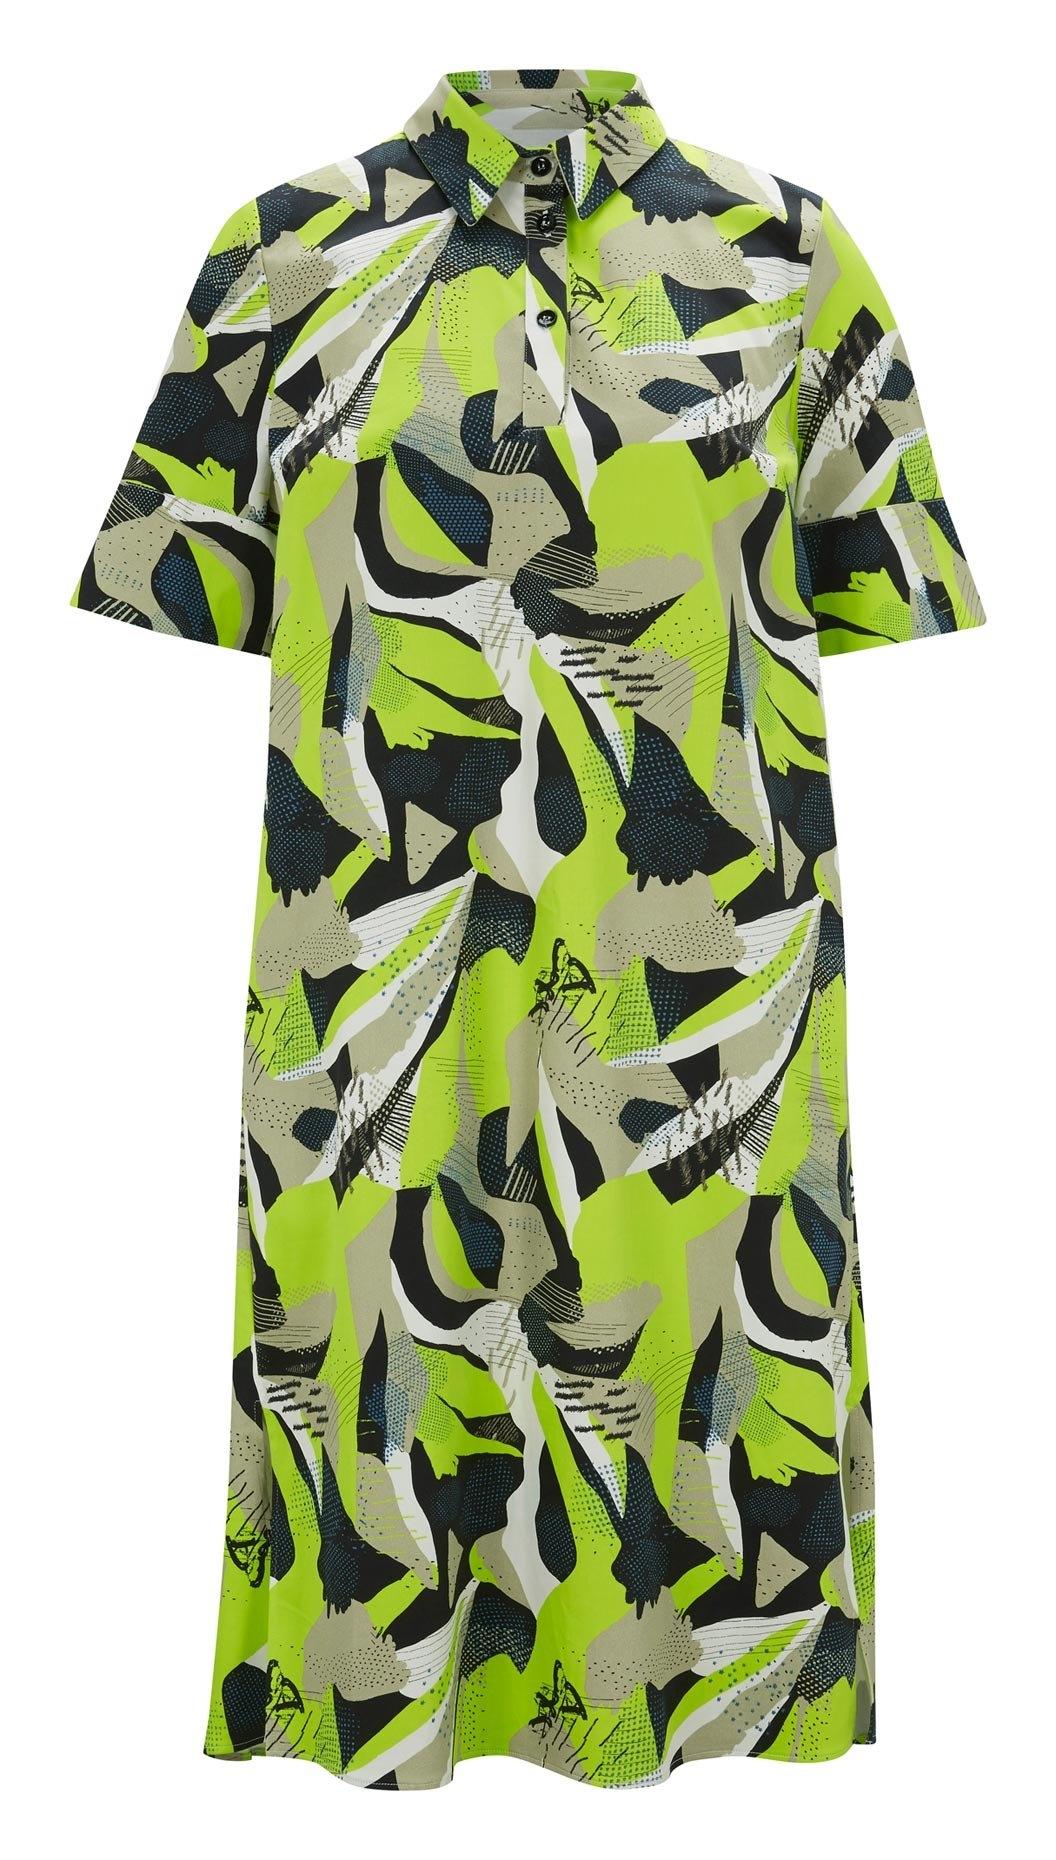 RICK CARDONA by Heine gedessineerde jurk - gratis ruilen op otto.nl